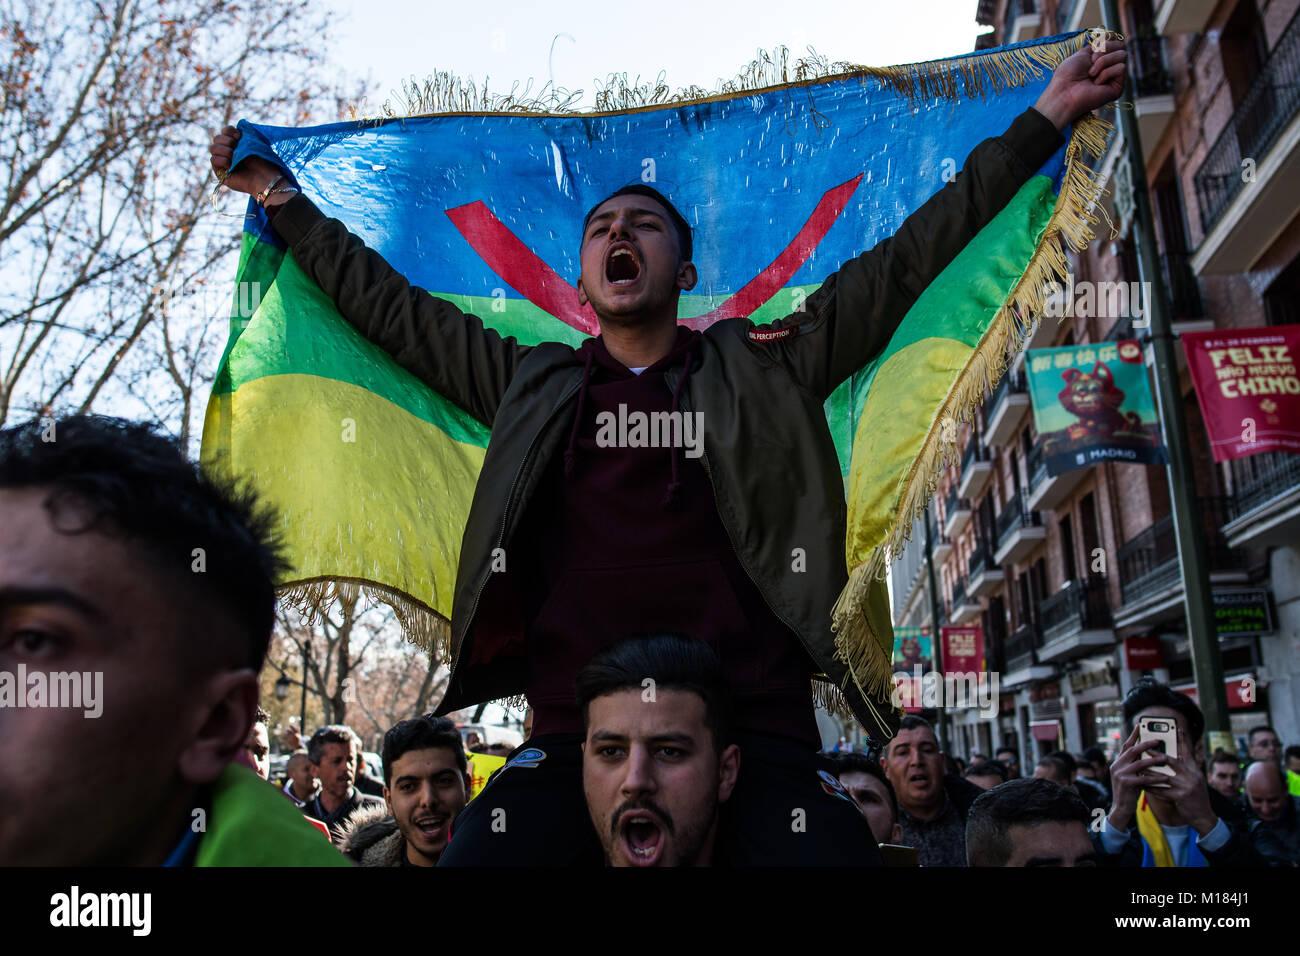 Madrid, Spain  28th Jan, 2018  A man shouting holding an